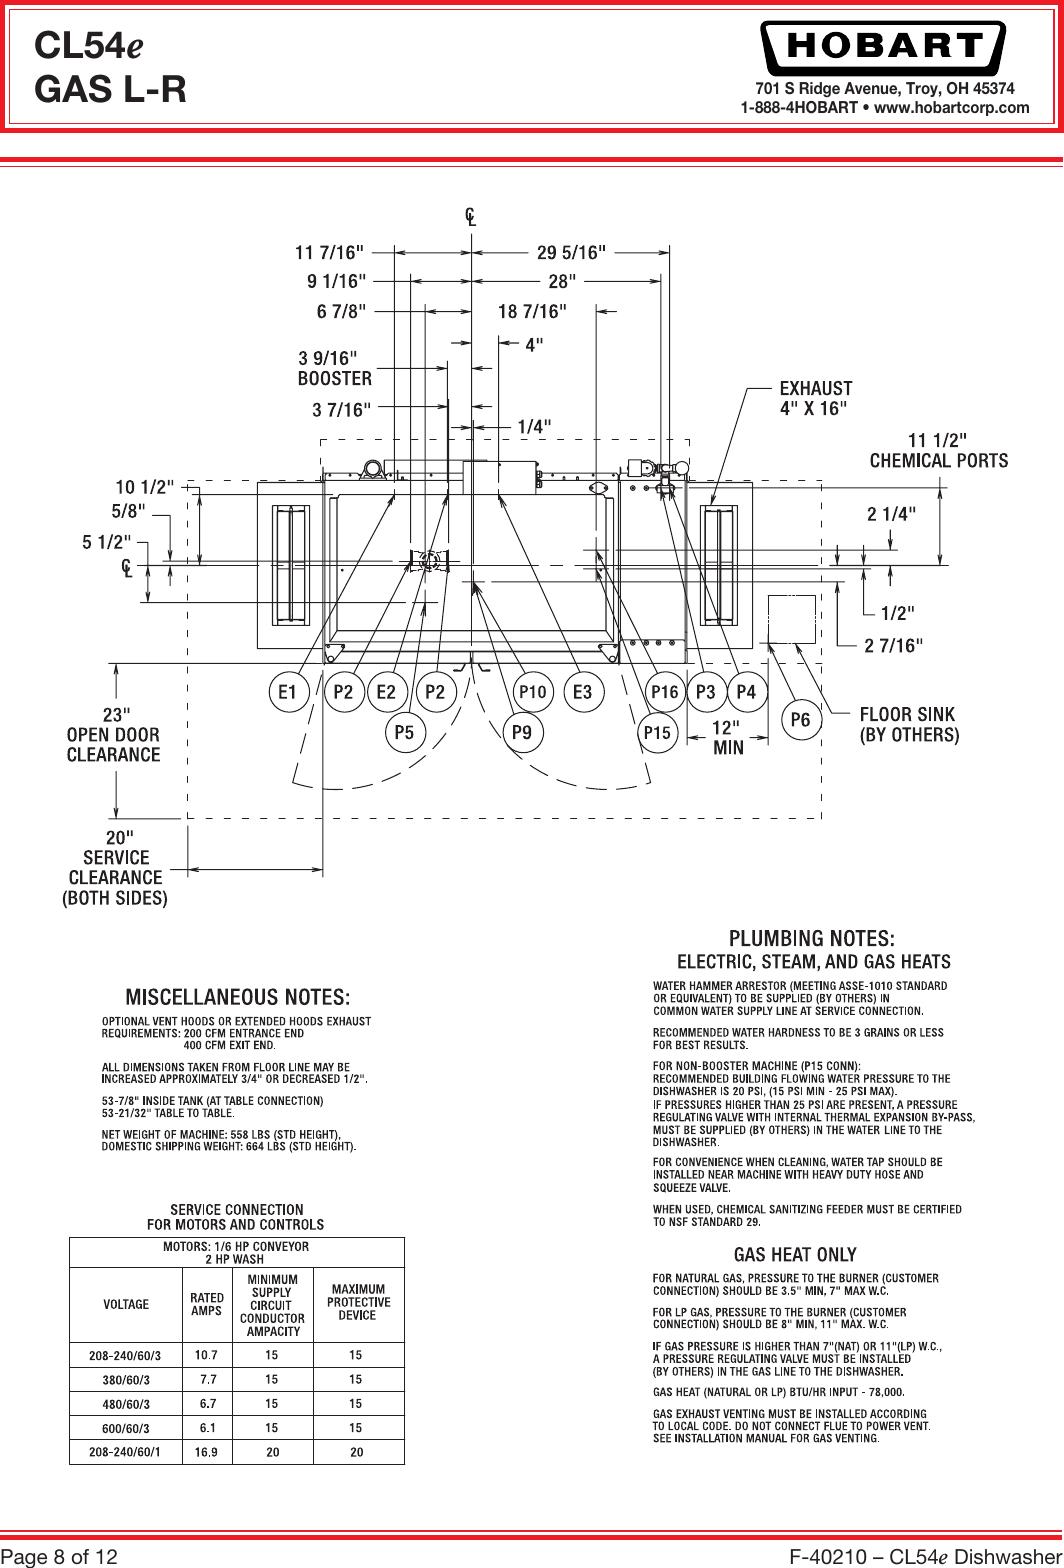 Hobart Cl54E Users Manual